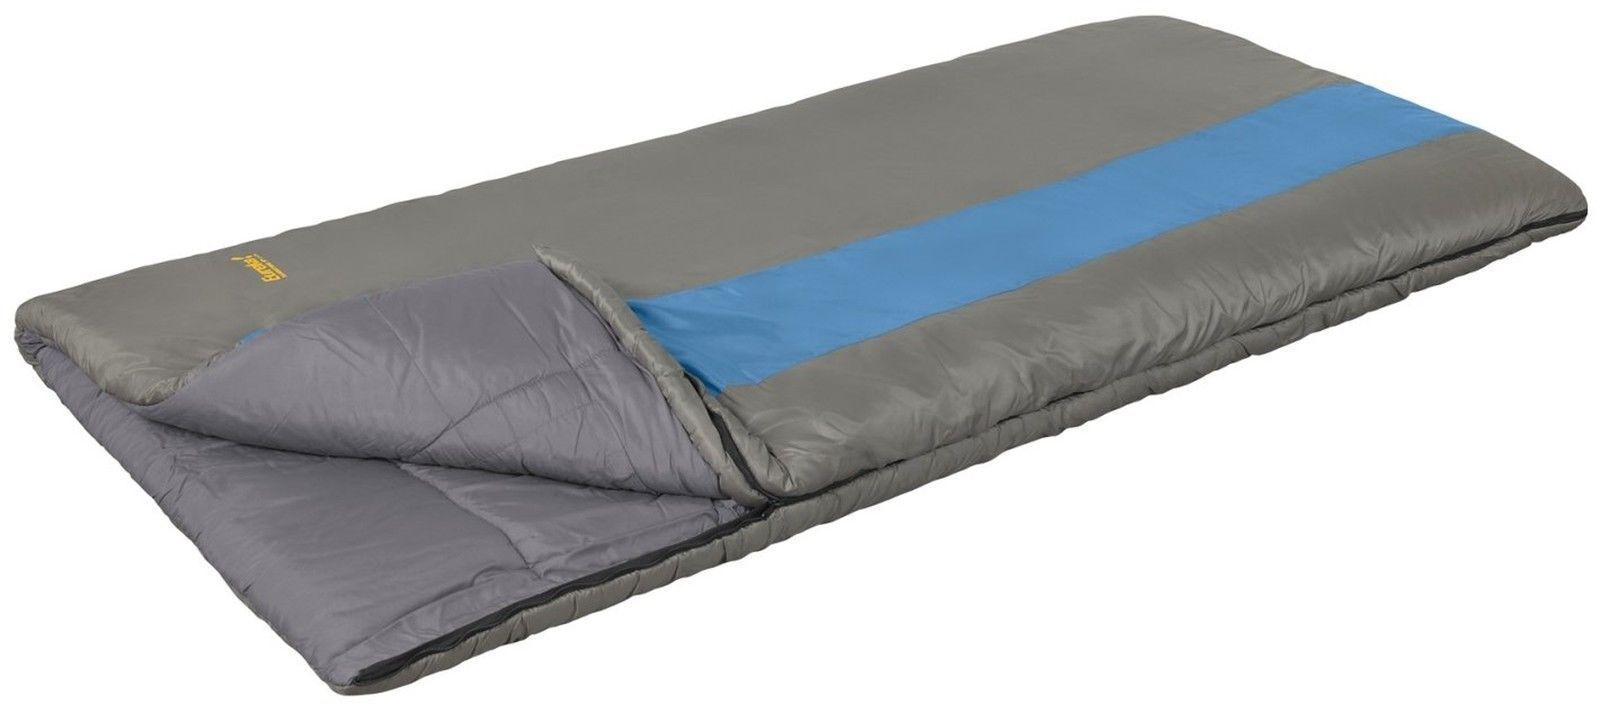 Eureka  Sandstone 30 Degree Rectangular 3 Season Sleeping Bag - Preowned 34 x 70